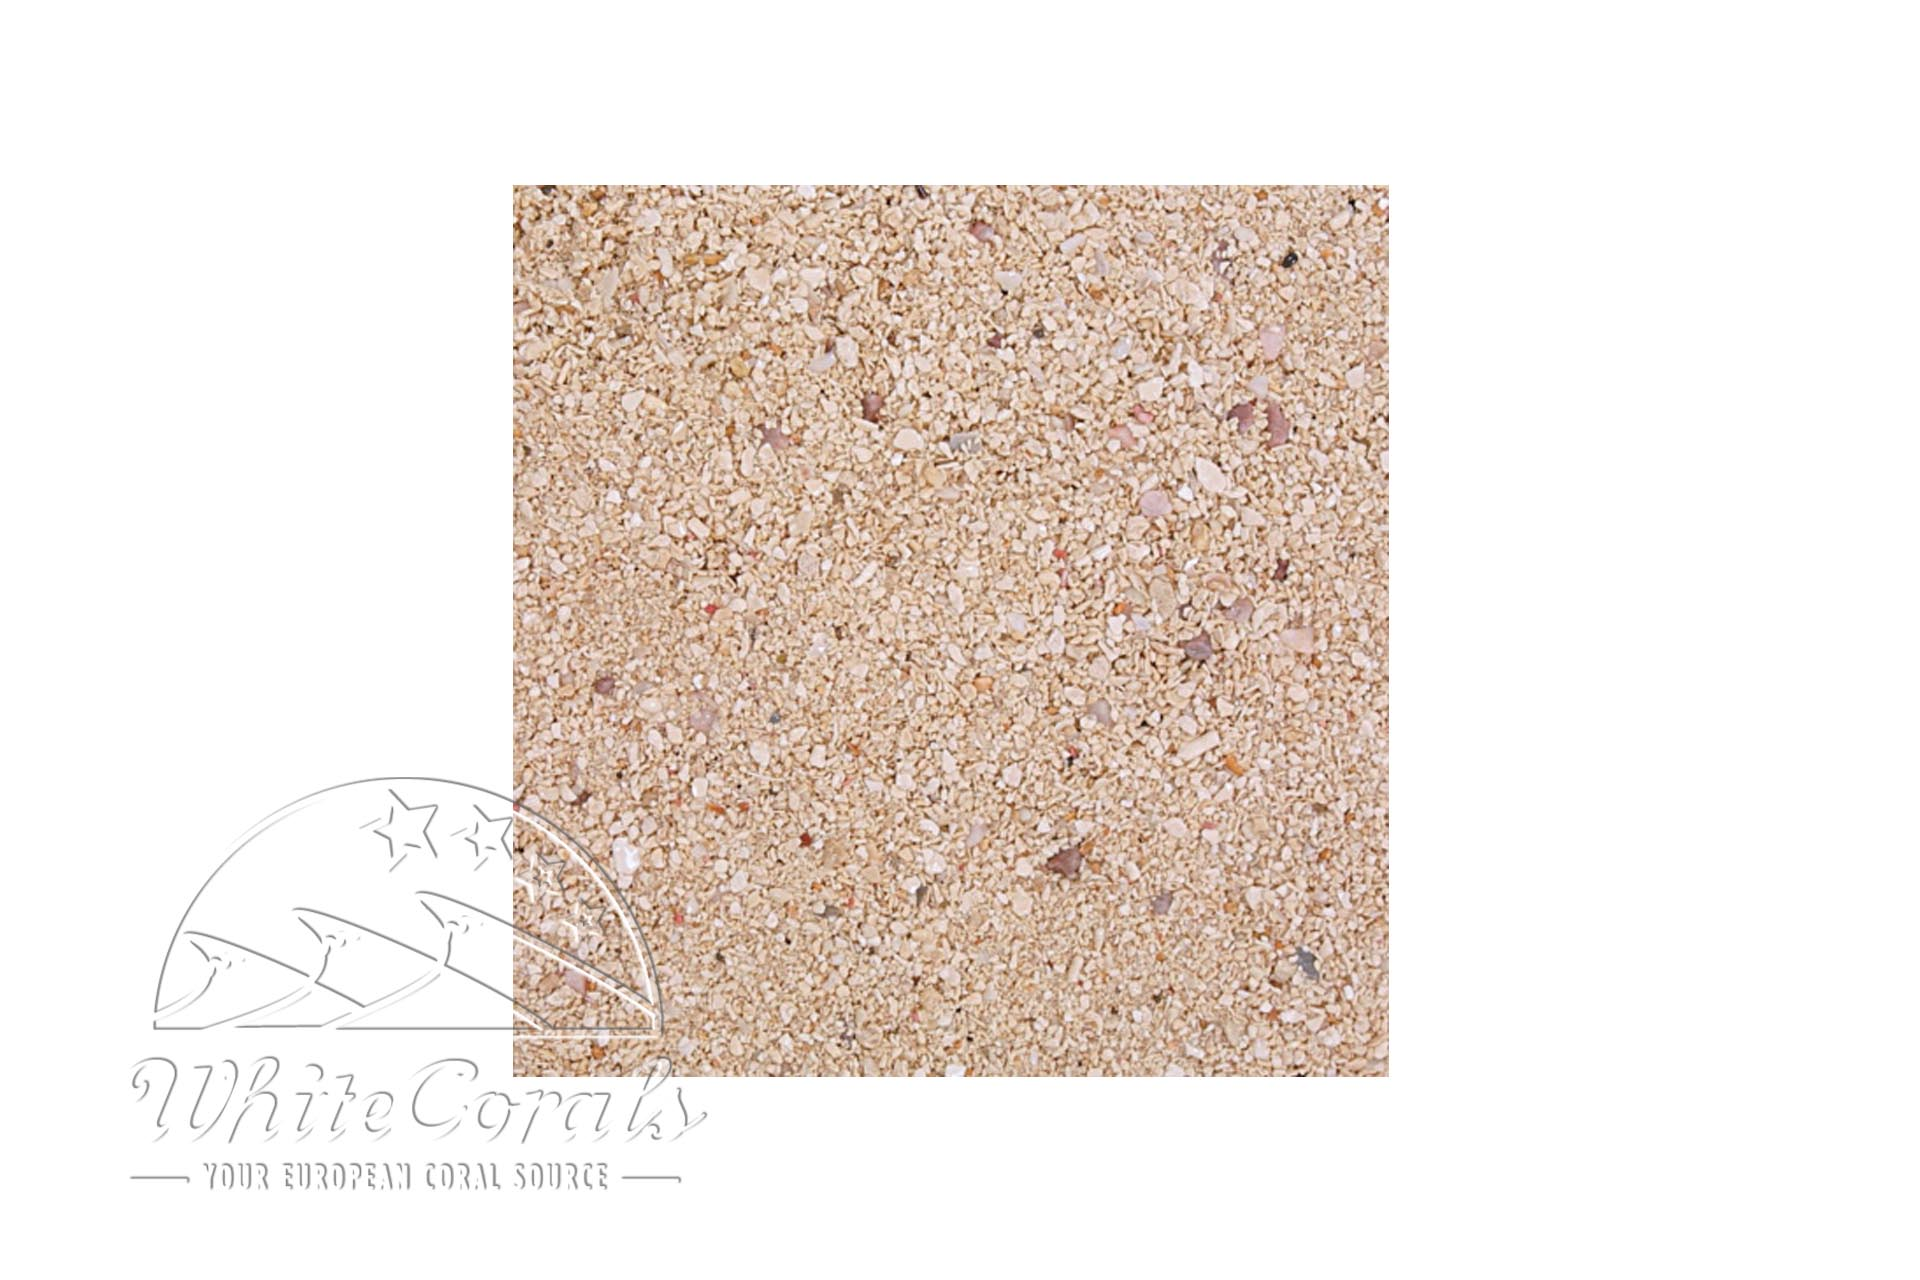 CaribSea Seaflor Fiji Pink Reef Sand 6,8 kg Sand